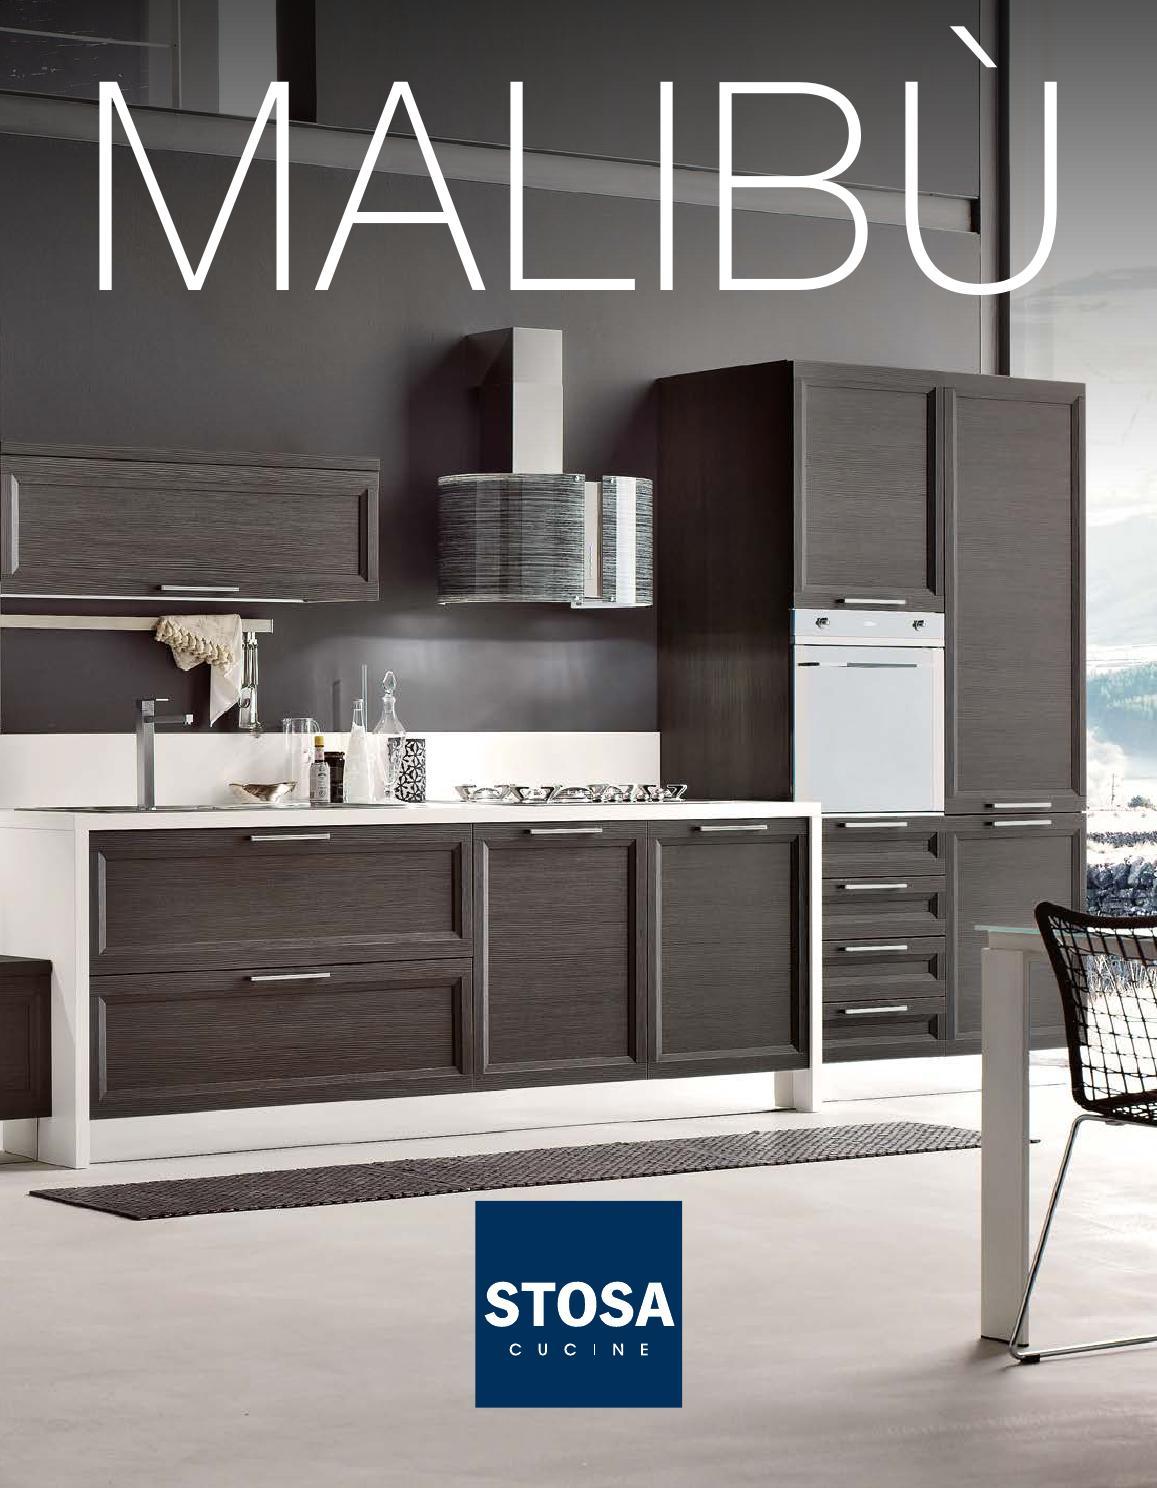 Catalogo cucine stosa moderne malib by stosa cucine issuu - Stosa cucine catalogo ...